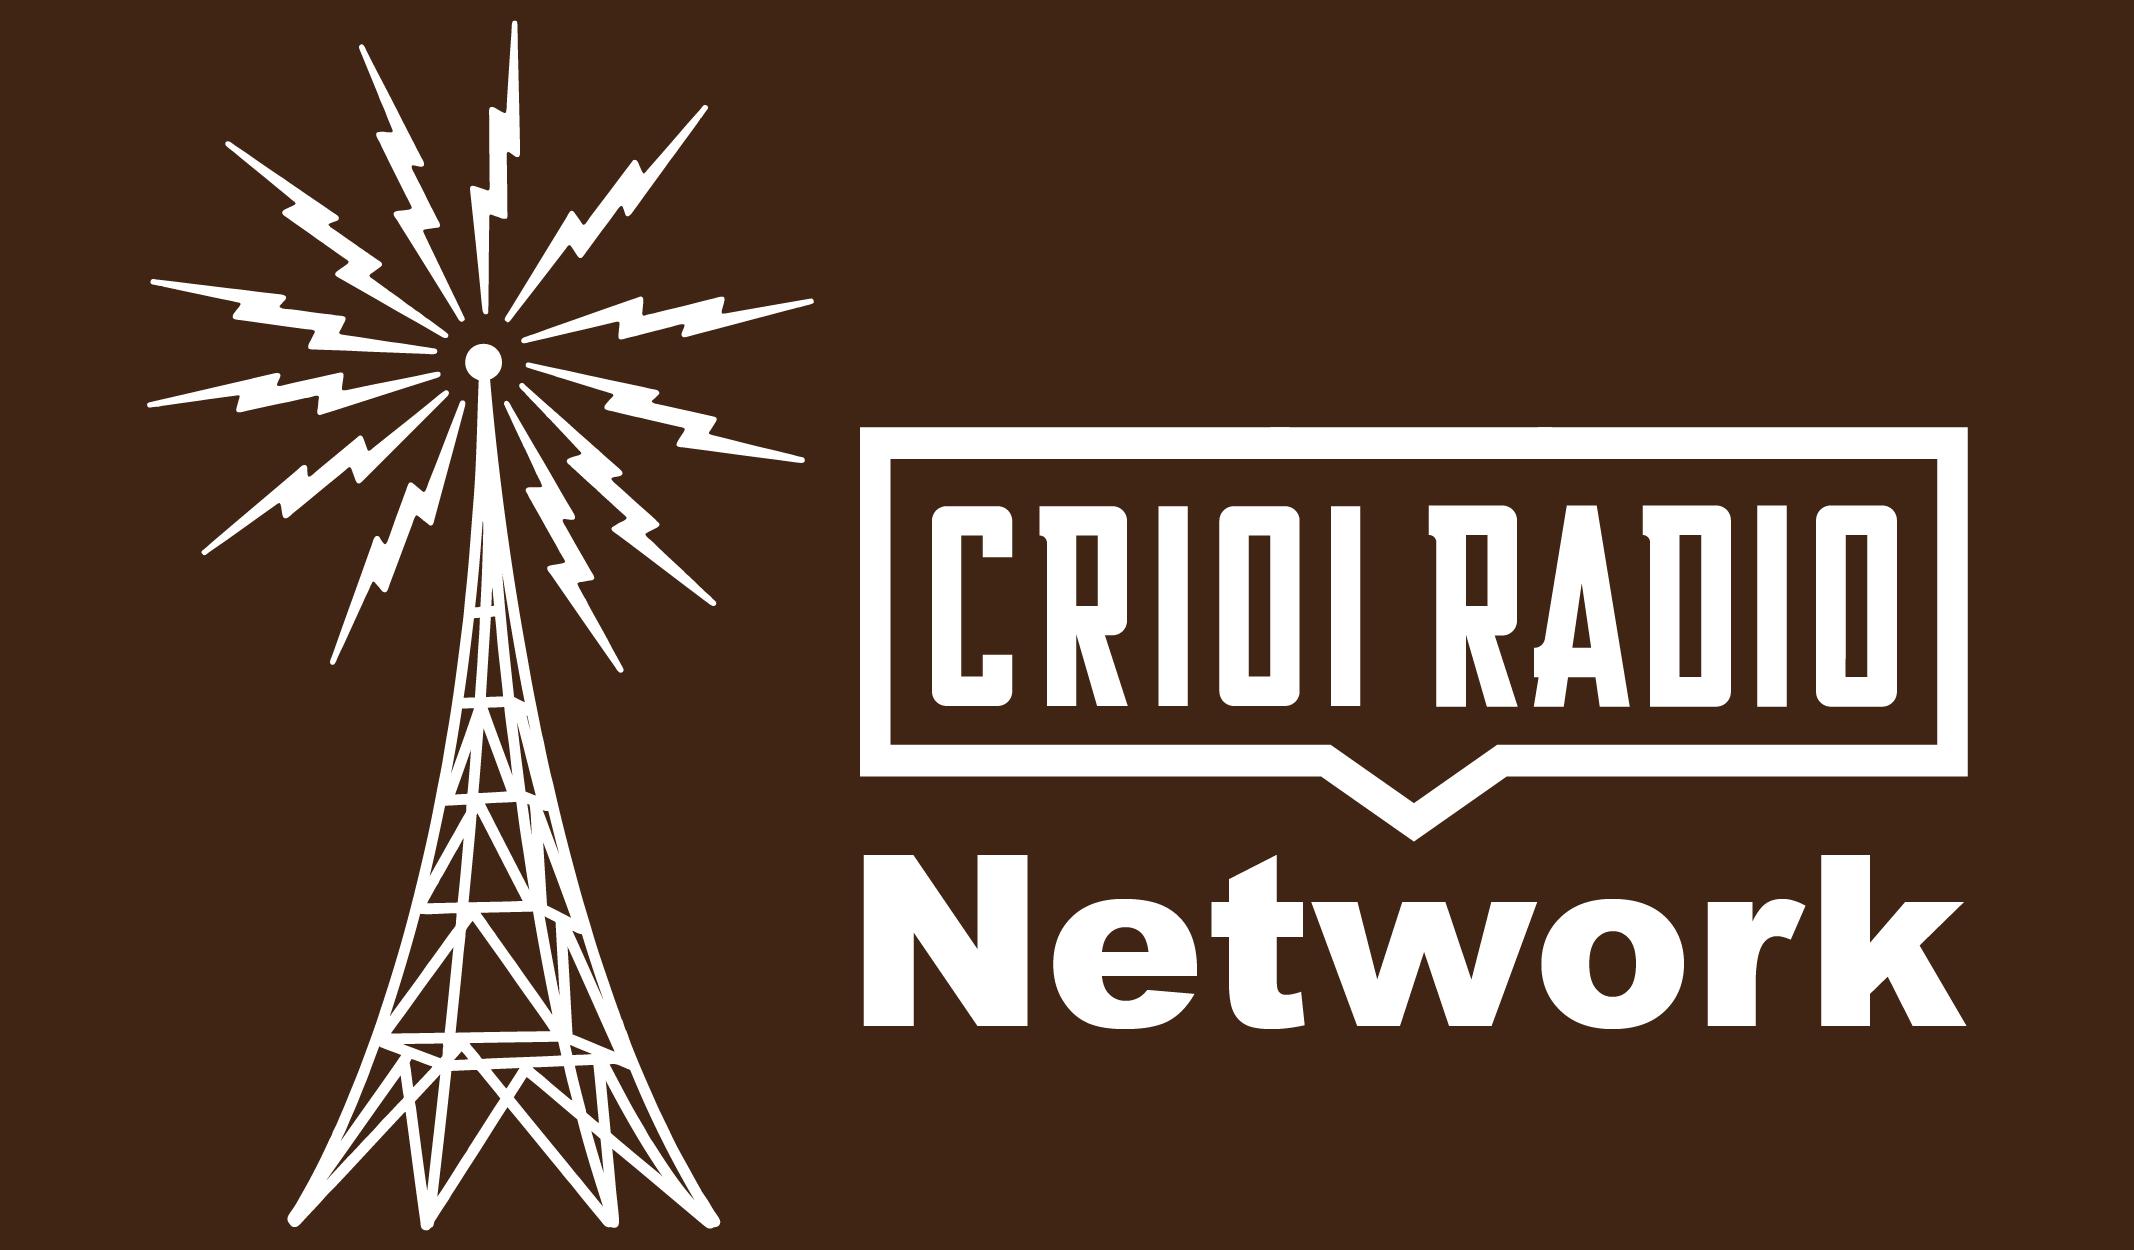 CR101 Radio